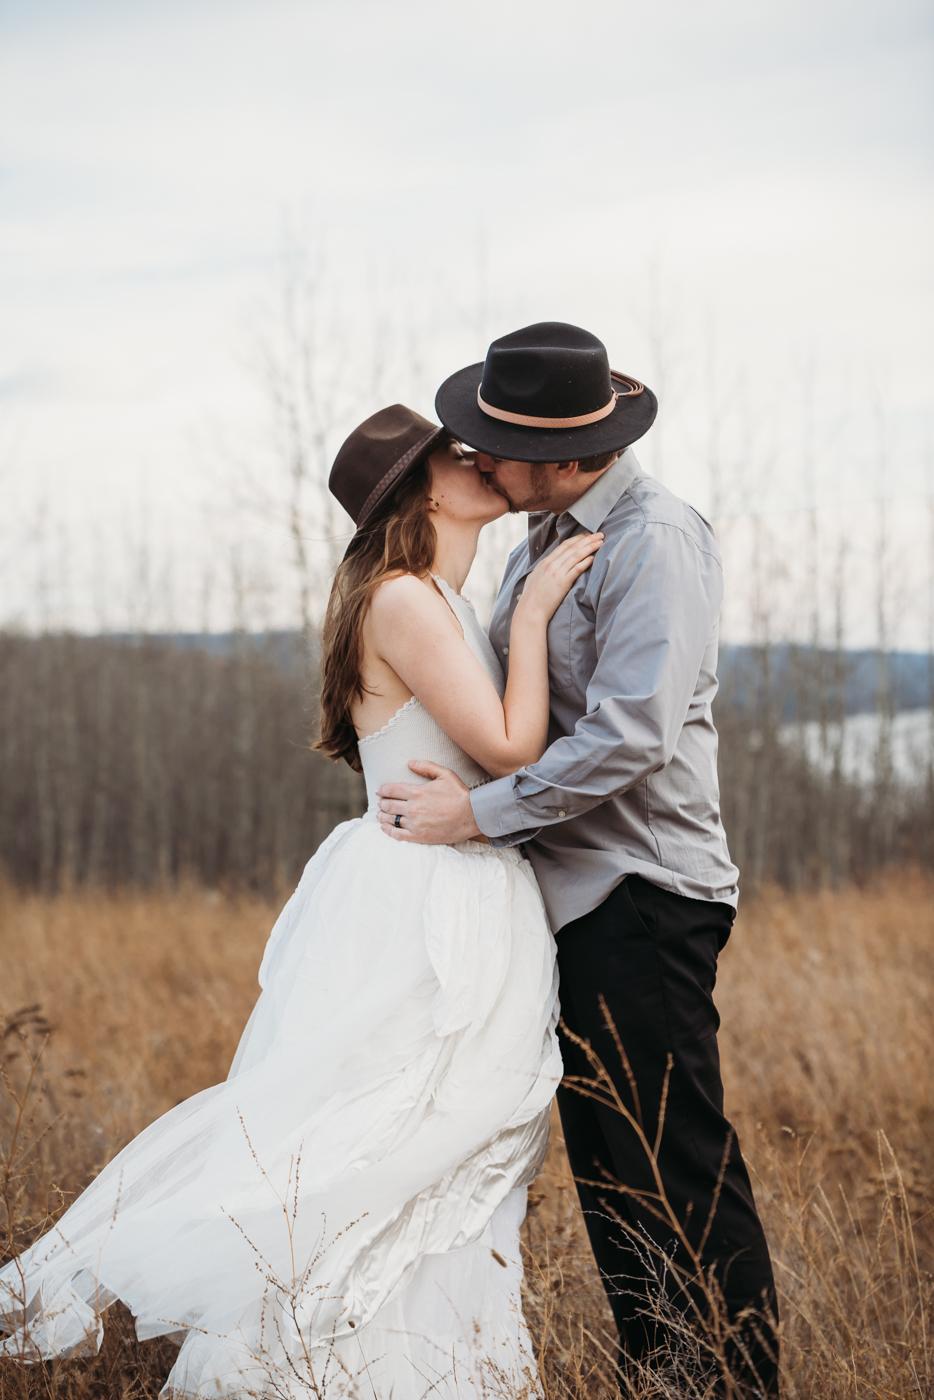 FortSt.John_photographer_TyraEPhotography_Wedding_Couple_Family_Photograhy_DawsonCreek_Elopement_Bride_Boduoir_Portraits-35.jpg